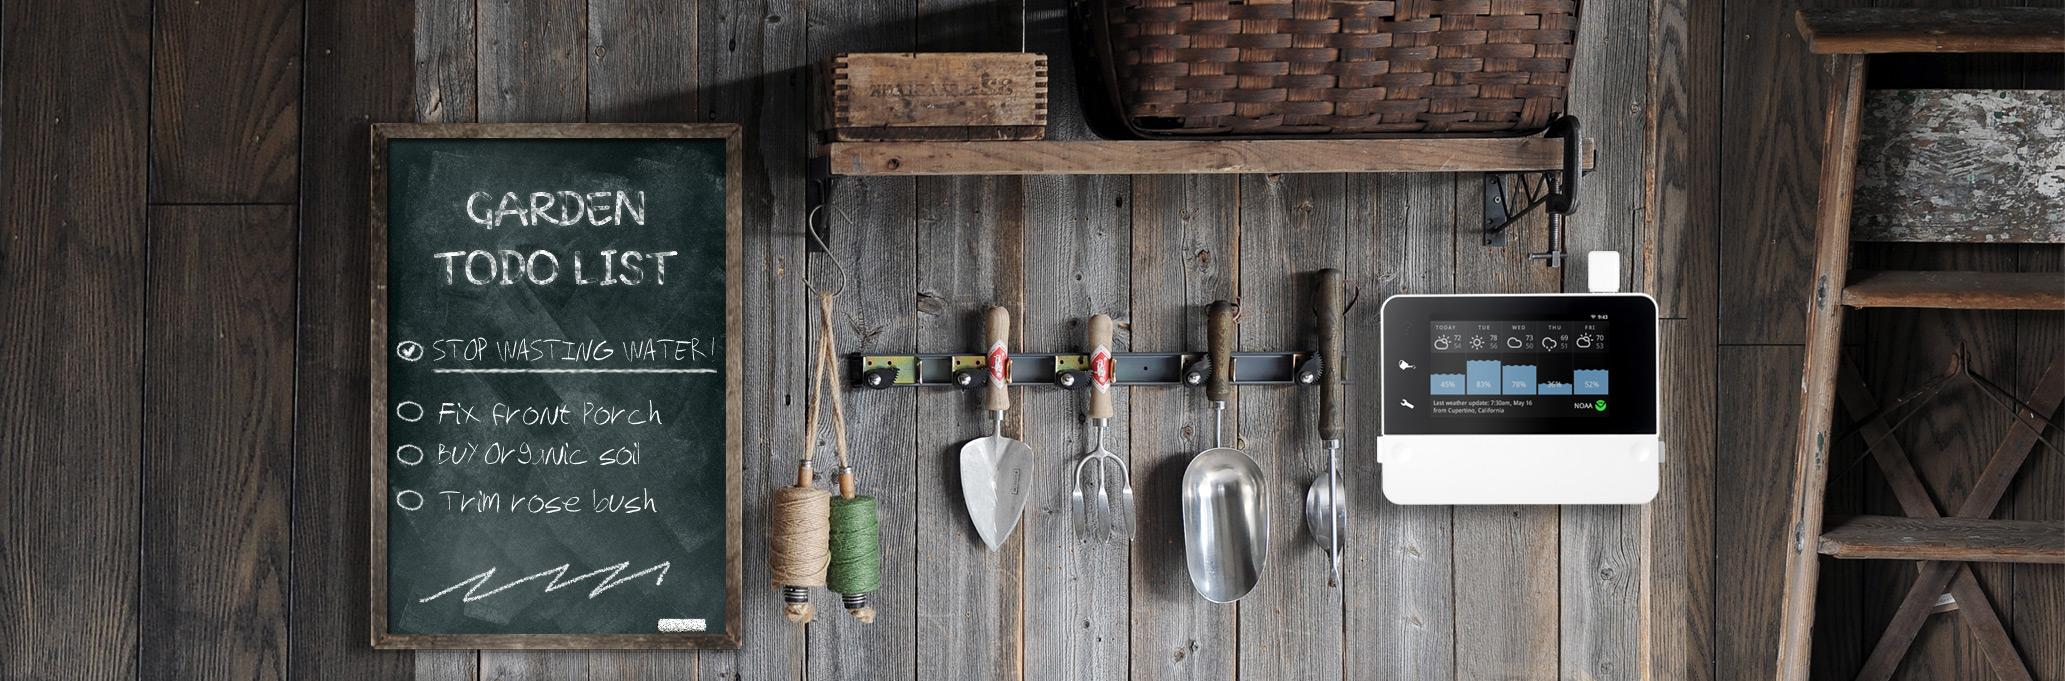 RainMachine HomeKit Bewässerungssteuerung